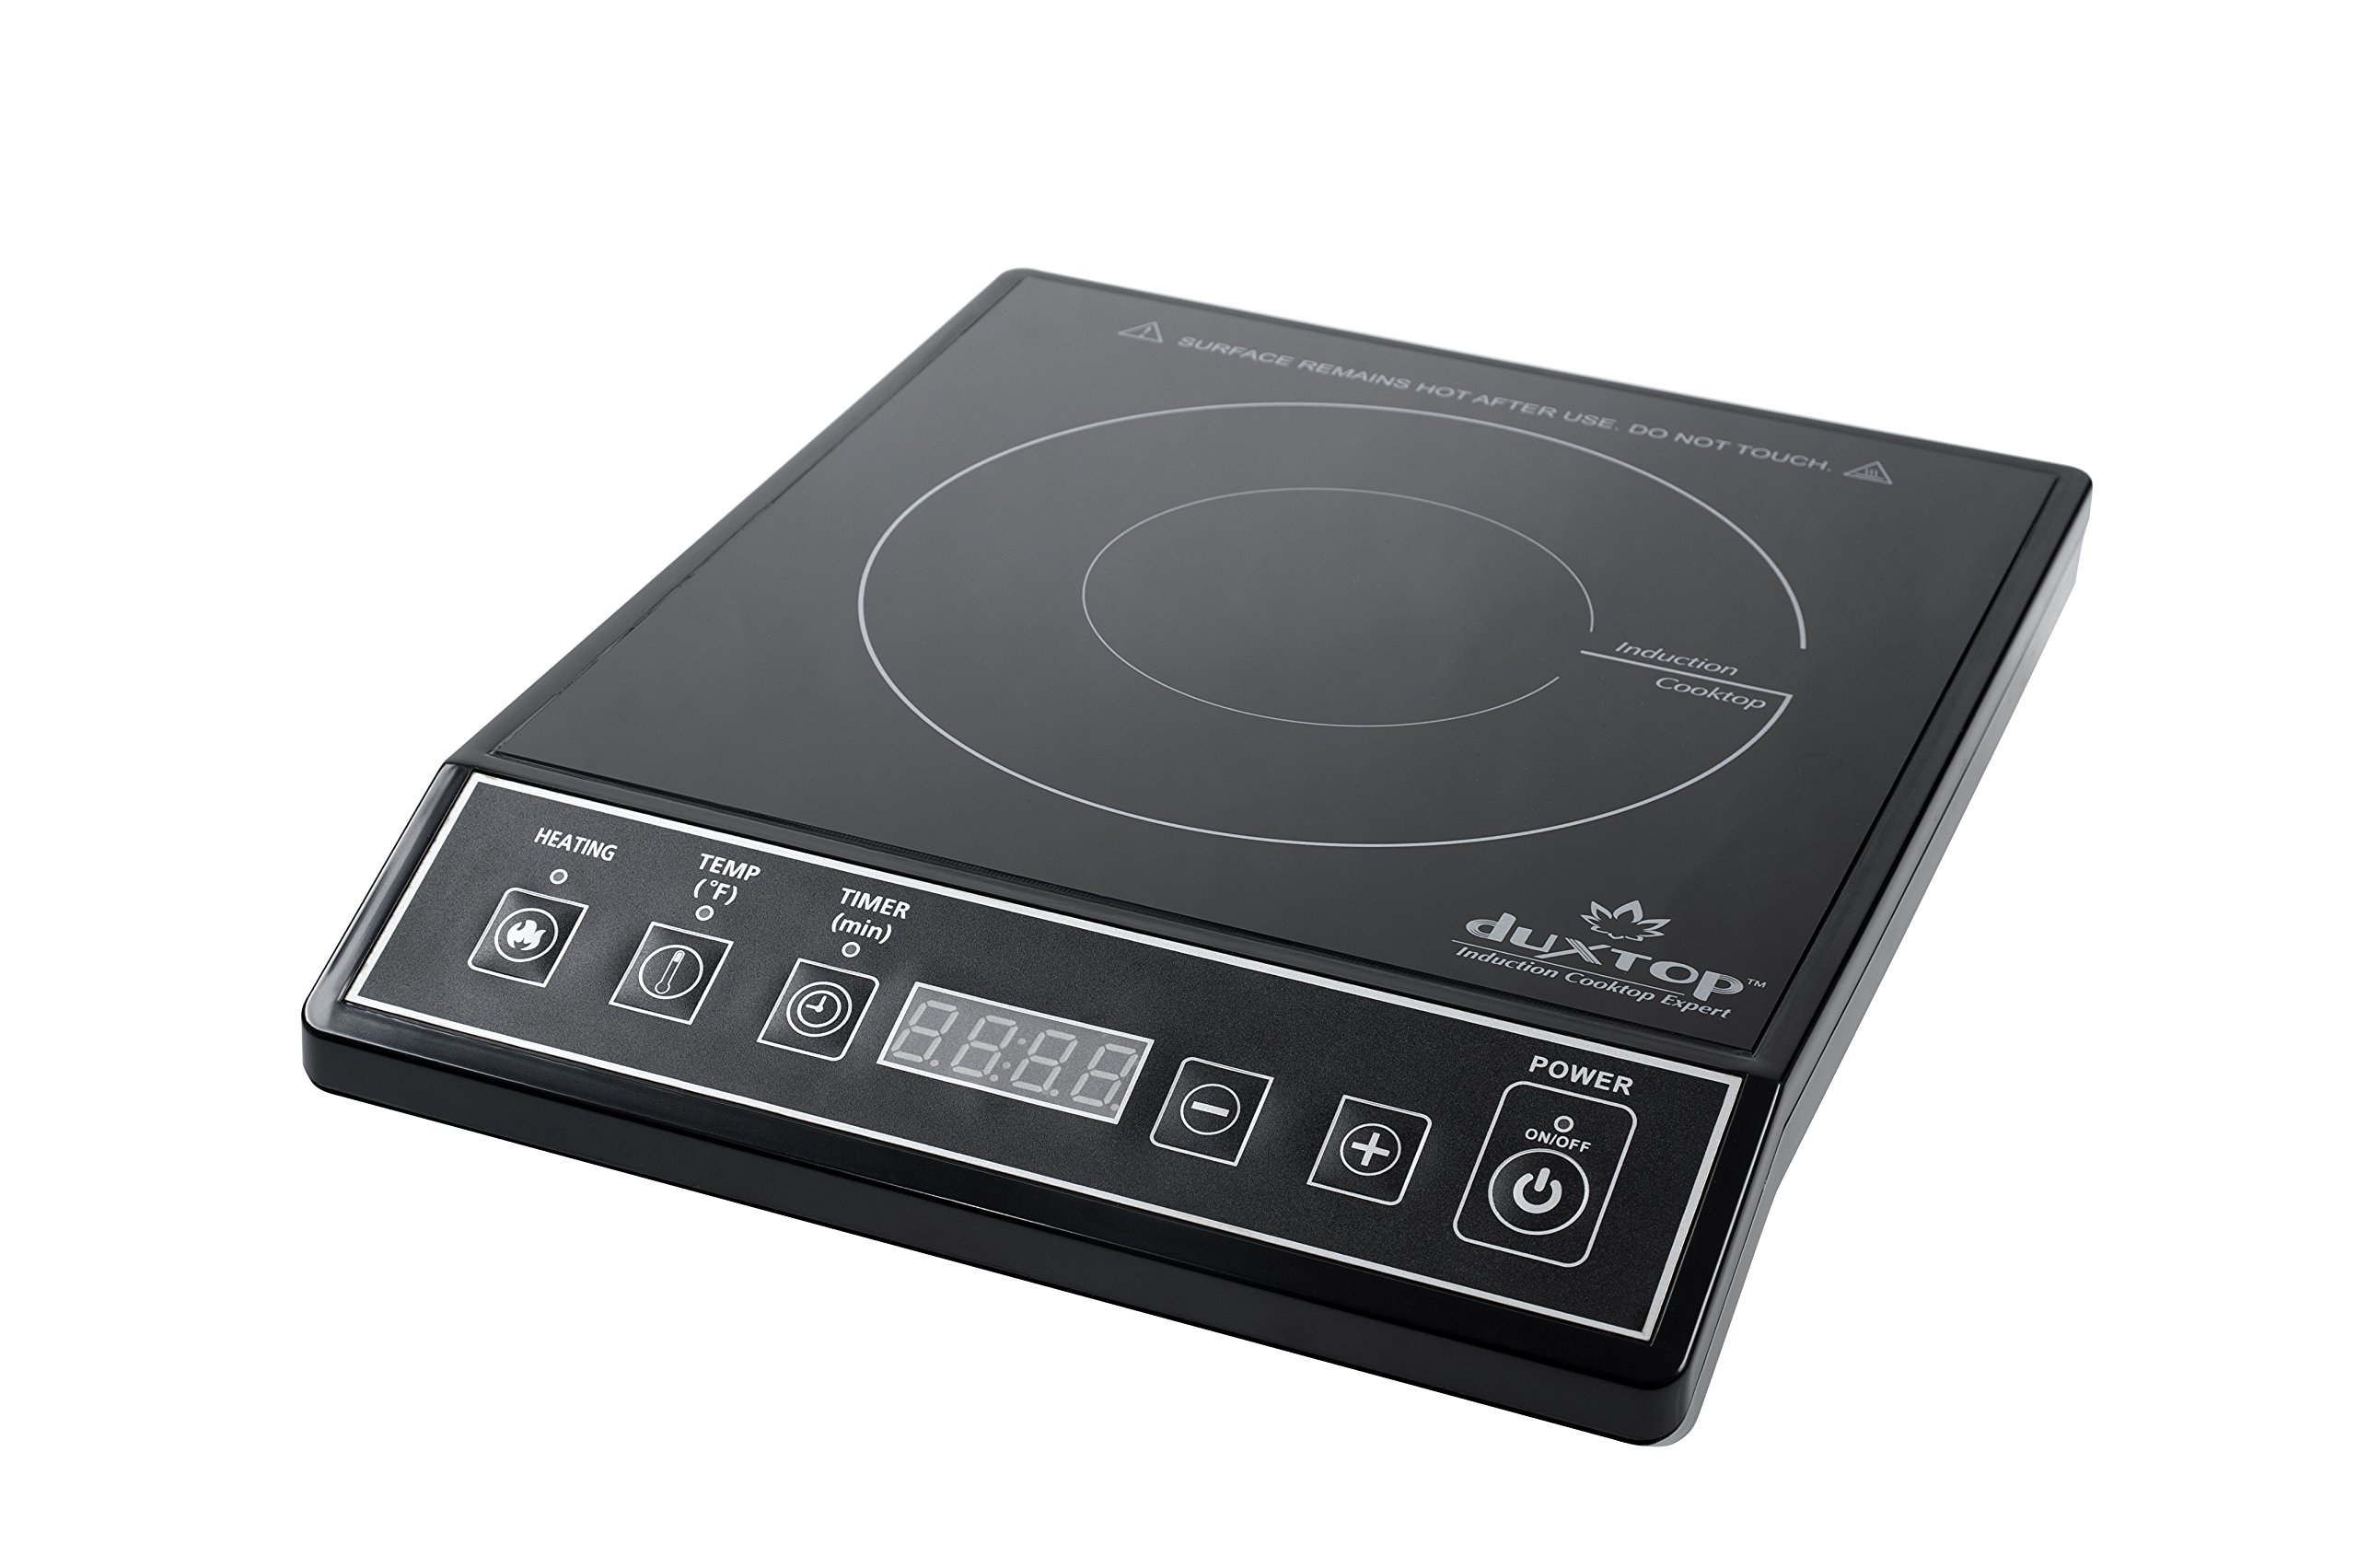 Secura 9100MC 1800W Portable Induction Cooktop Countertop Burner, Black by Secura (Image #4)